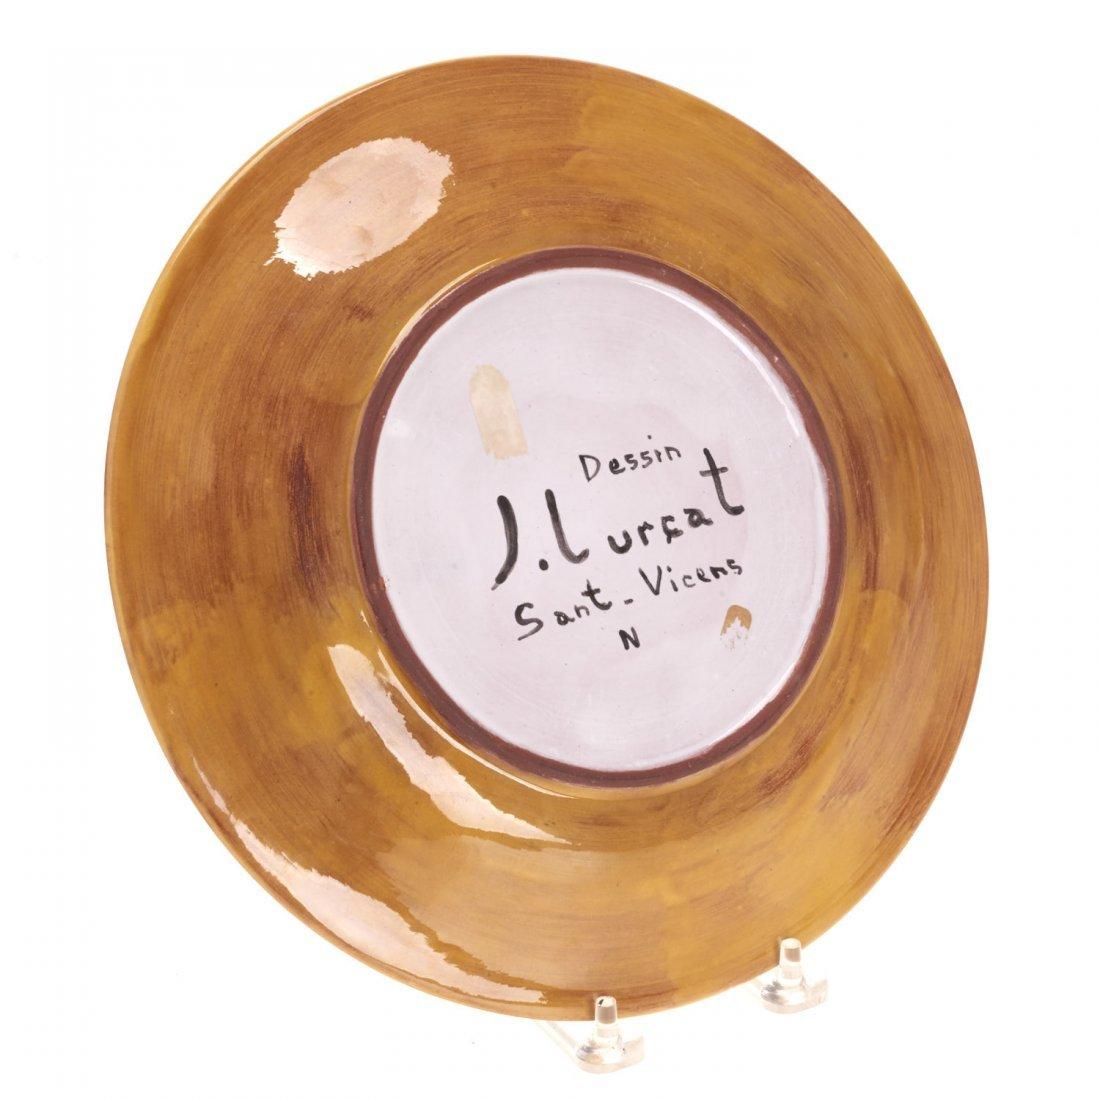 Jean Lurcat glazed ceramic dish - 4